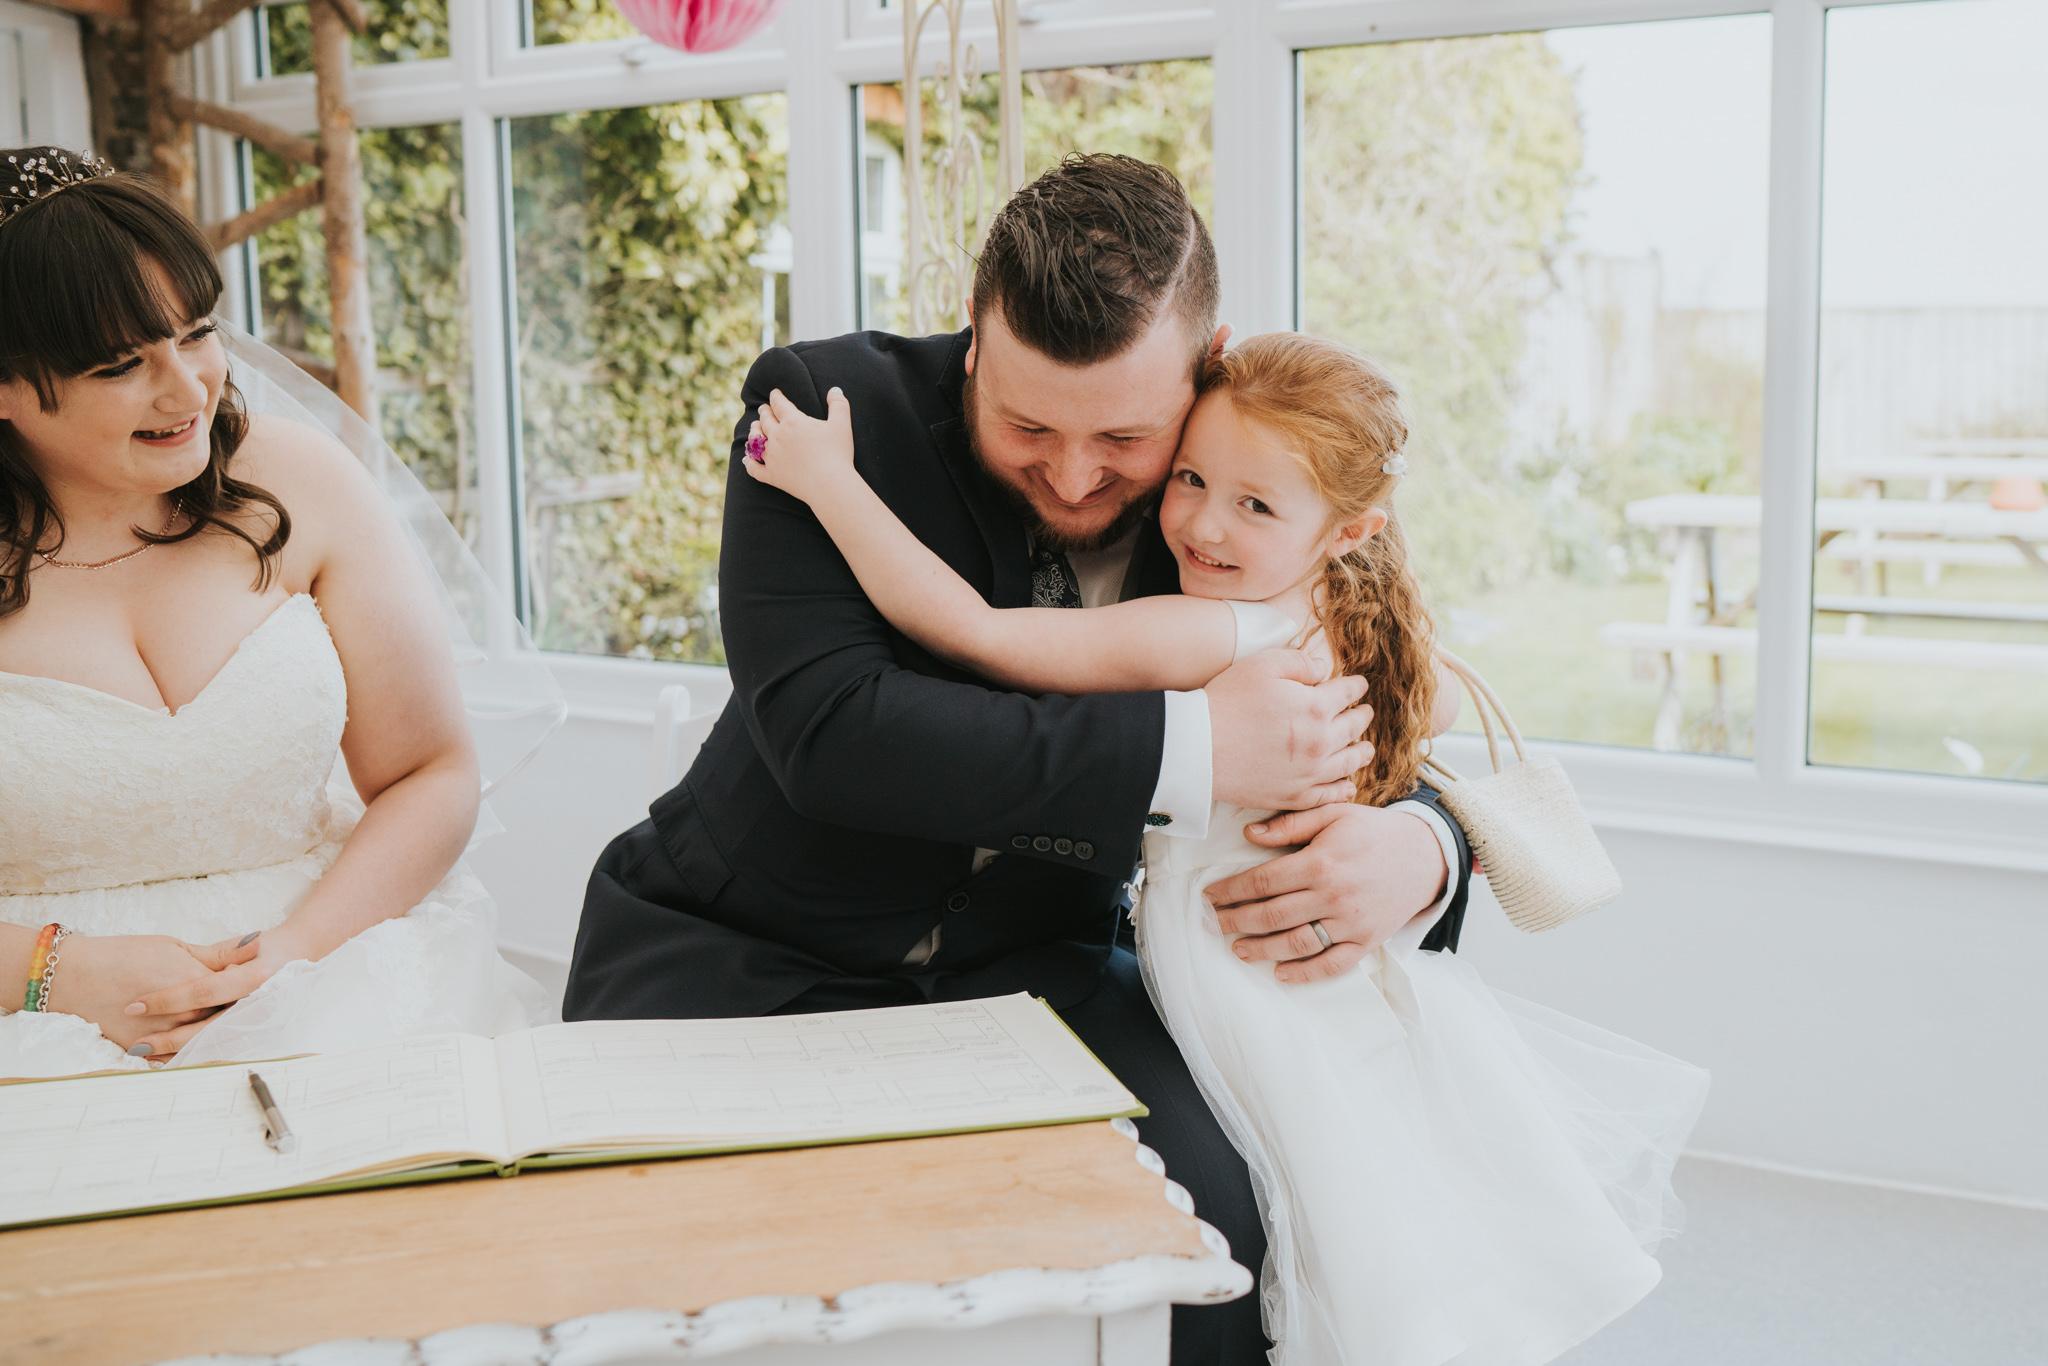 grace-sam-old-barn-clovelly-devon-wedding-photographer-grace-elizabeth-essex-suffolk-norfolk-wedding-photographer (64 of 132).jpg